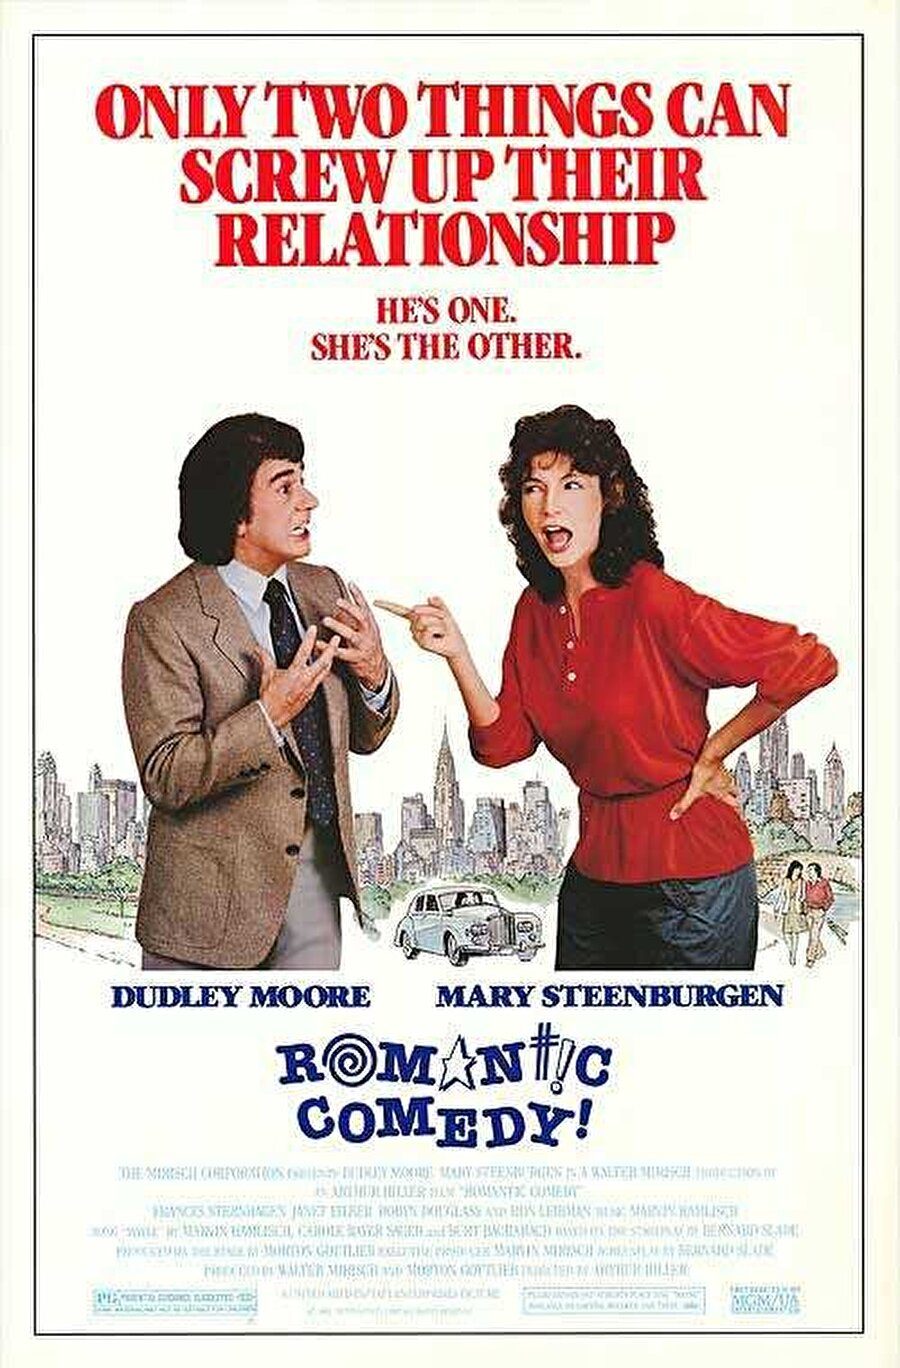 Romantic Comedy (1983) Yönetmen: Arthur Hiller Yazar: Bernard Slade Oyuncular: Dudley Moore, Mary Steenburgen, Frances Sternhagen, Janet Eilber, Robyn Douglass, Ron Leibman